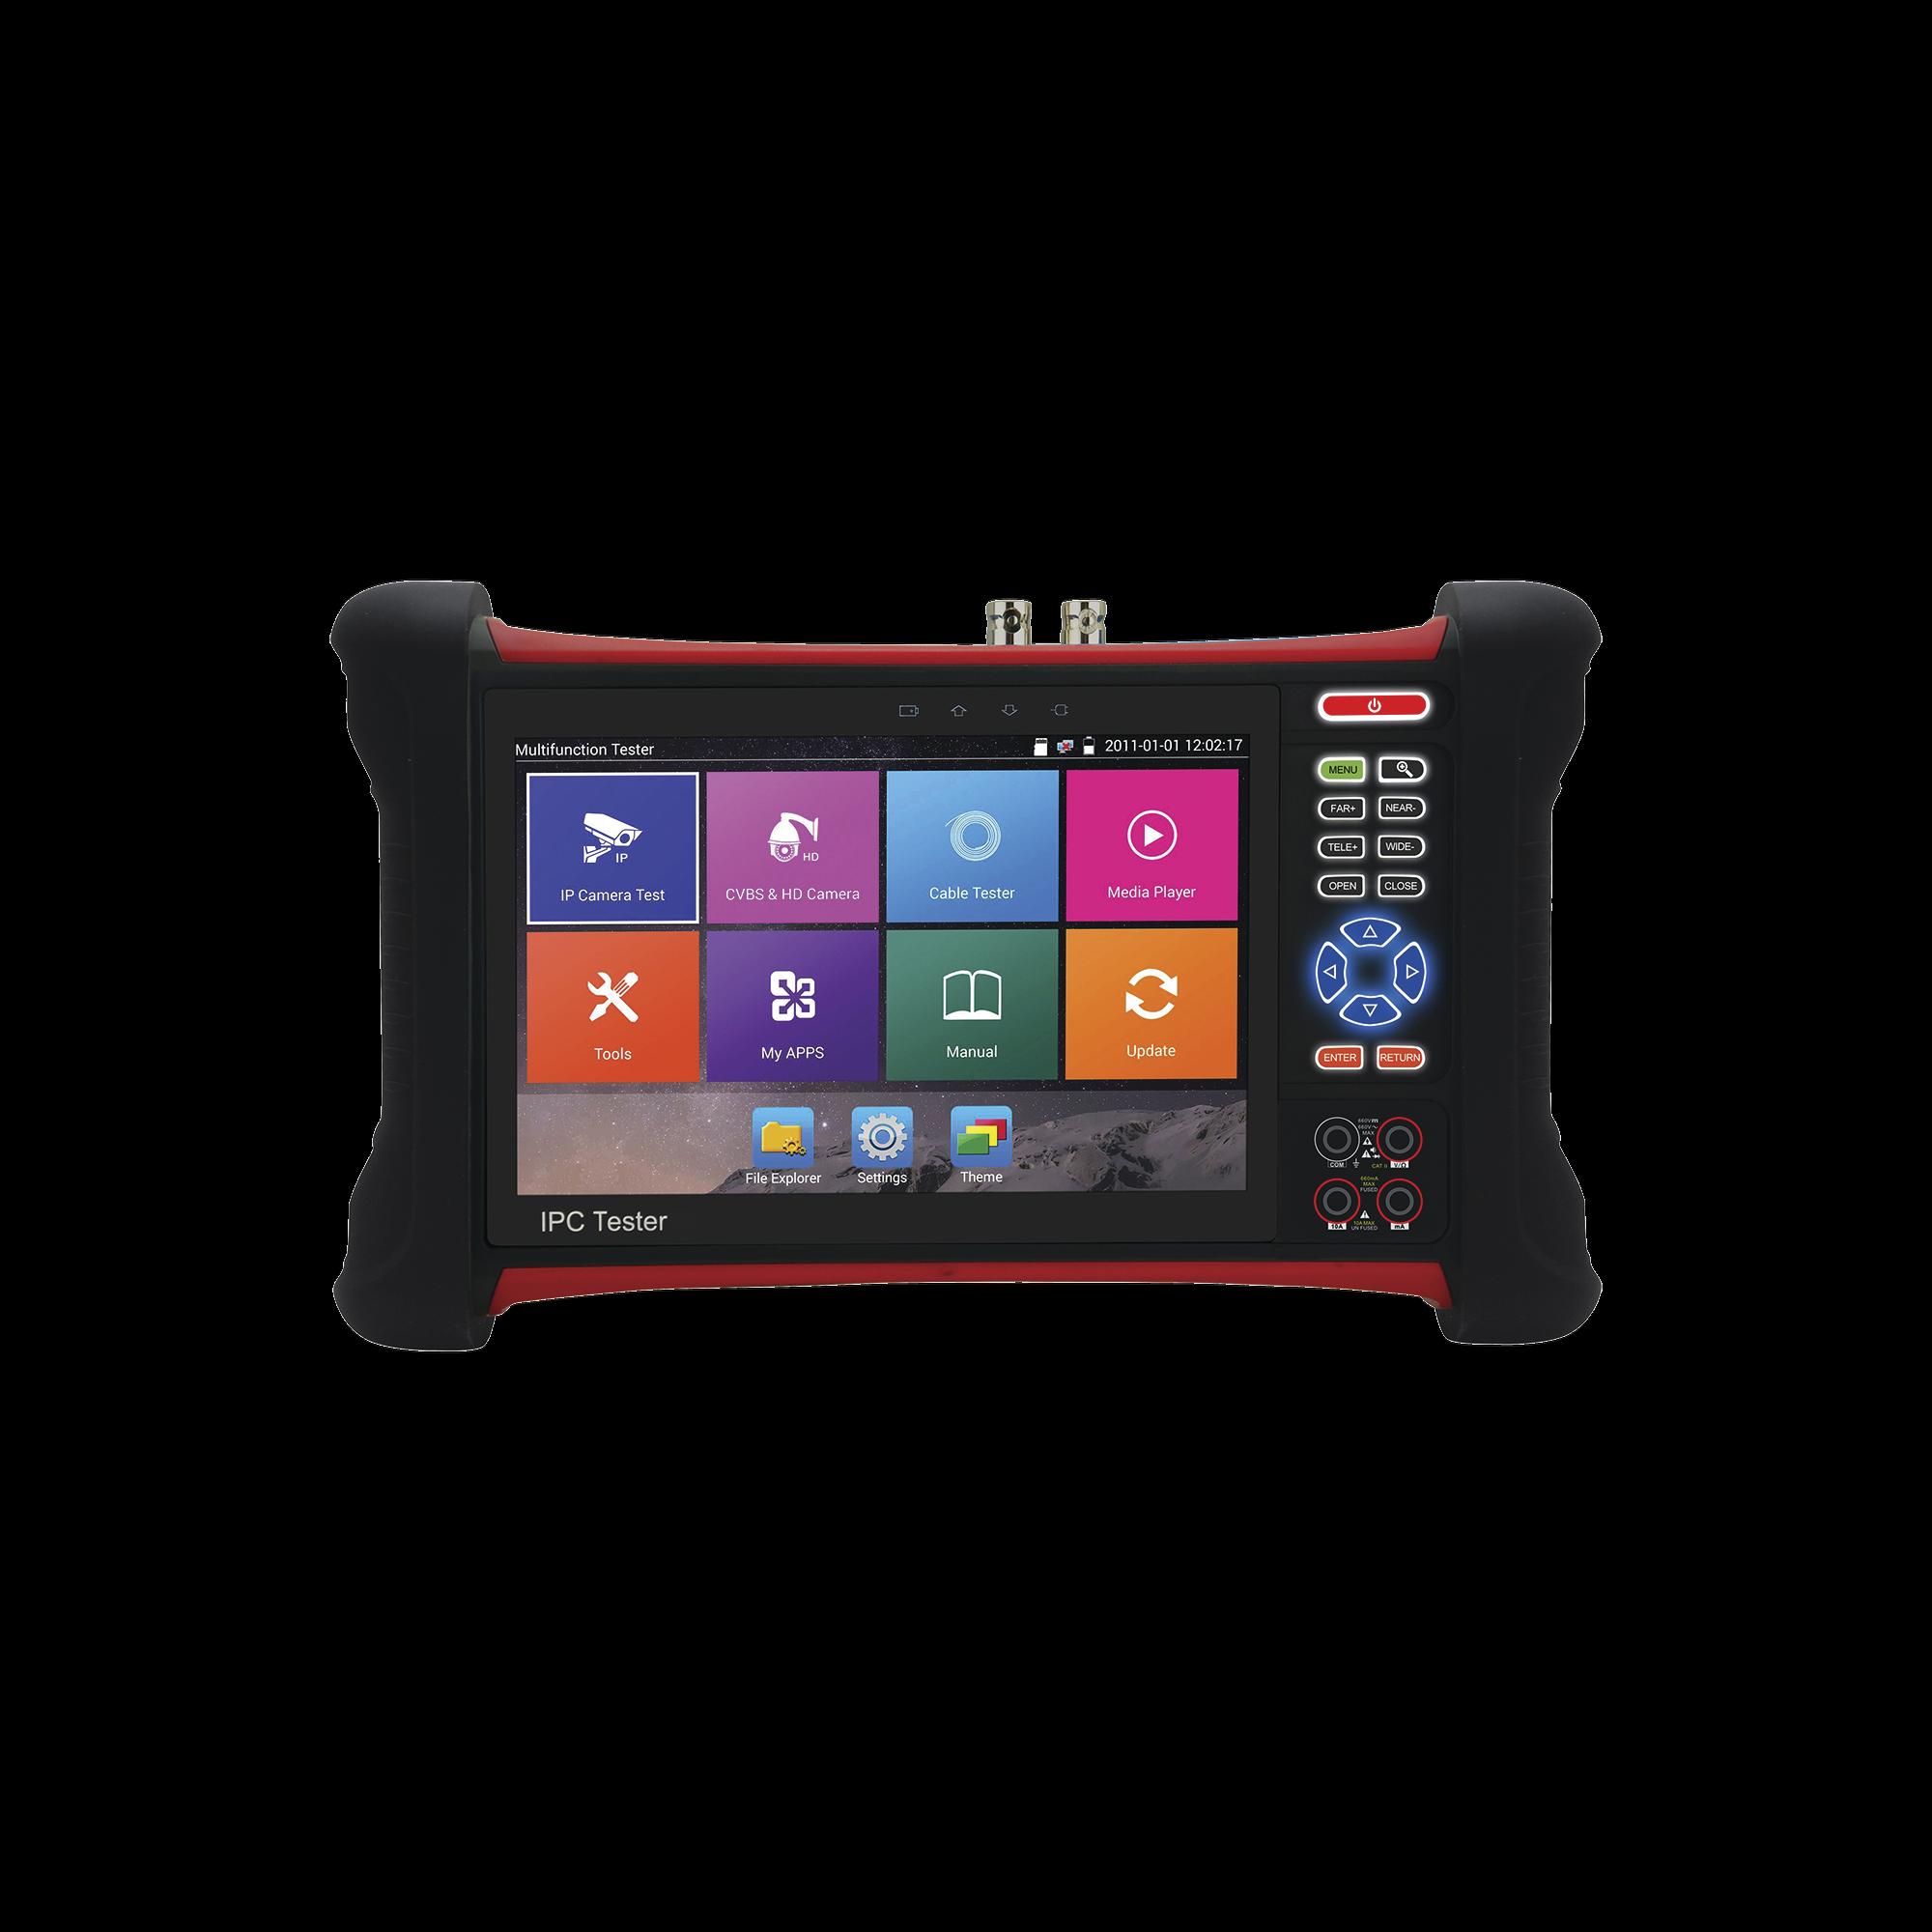 Probador de Vídeo Android con Pantalla LCD de 7 para IP ONVIF / HD-TVI 8MP (TurboHD) / Análogo, ONVIF, Wi-Fi, Scanner IP, WiFi, entrada HDMI